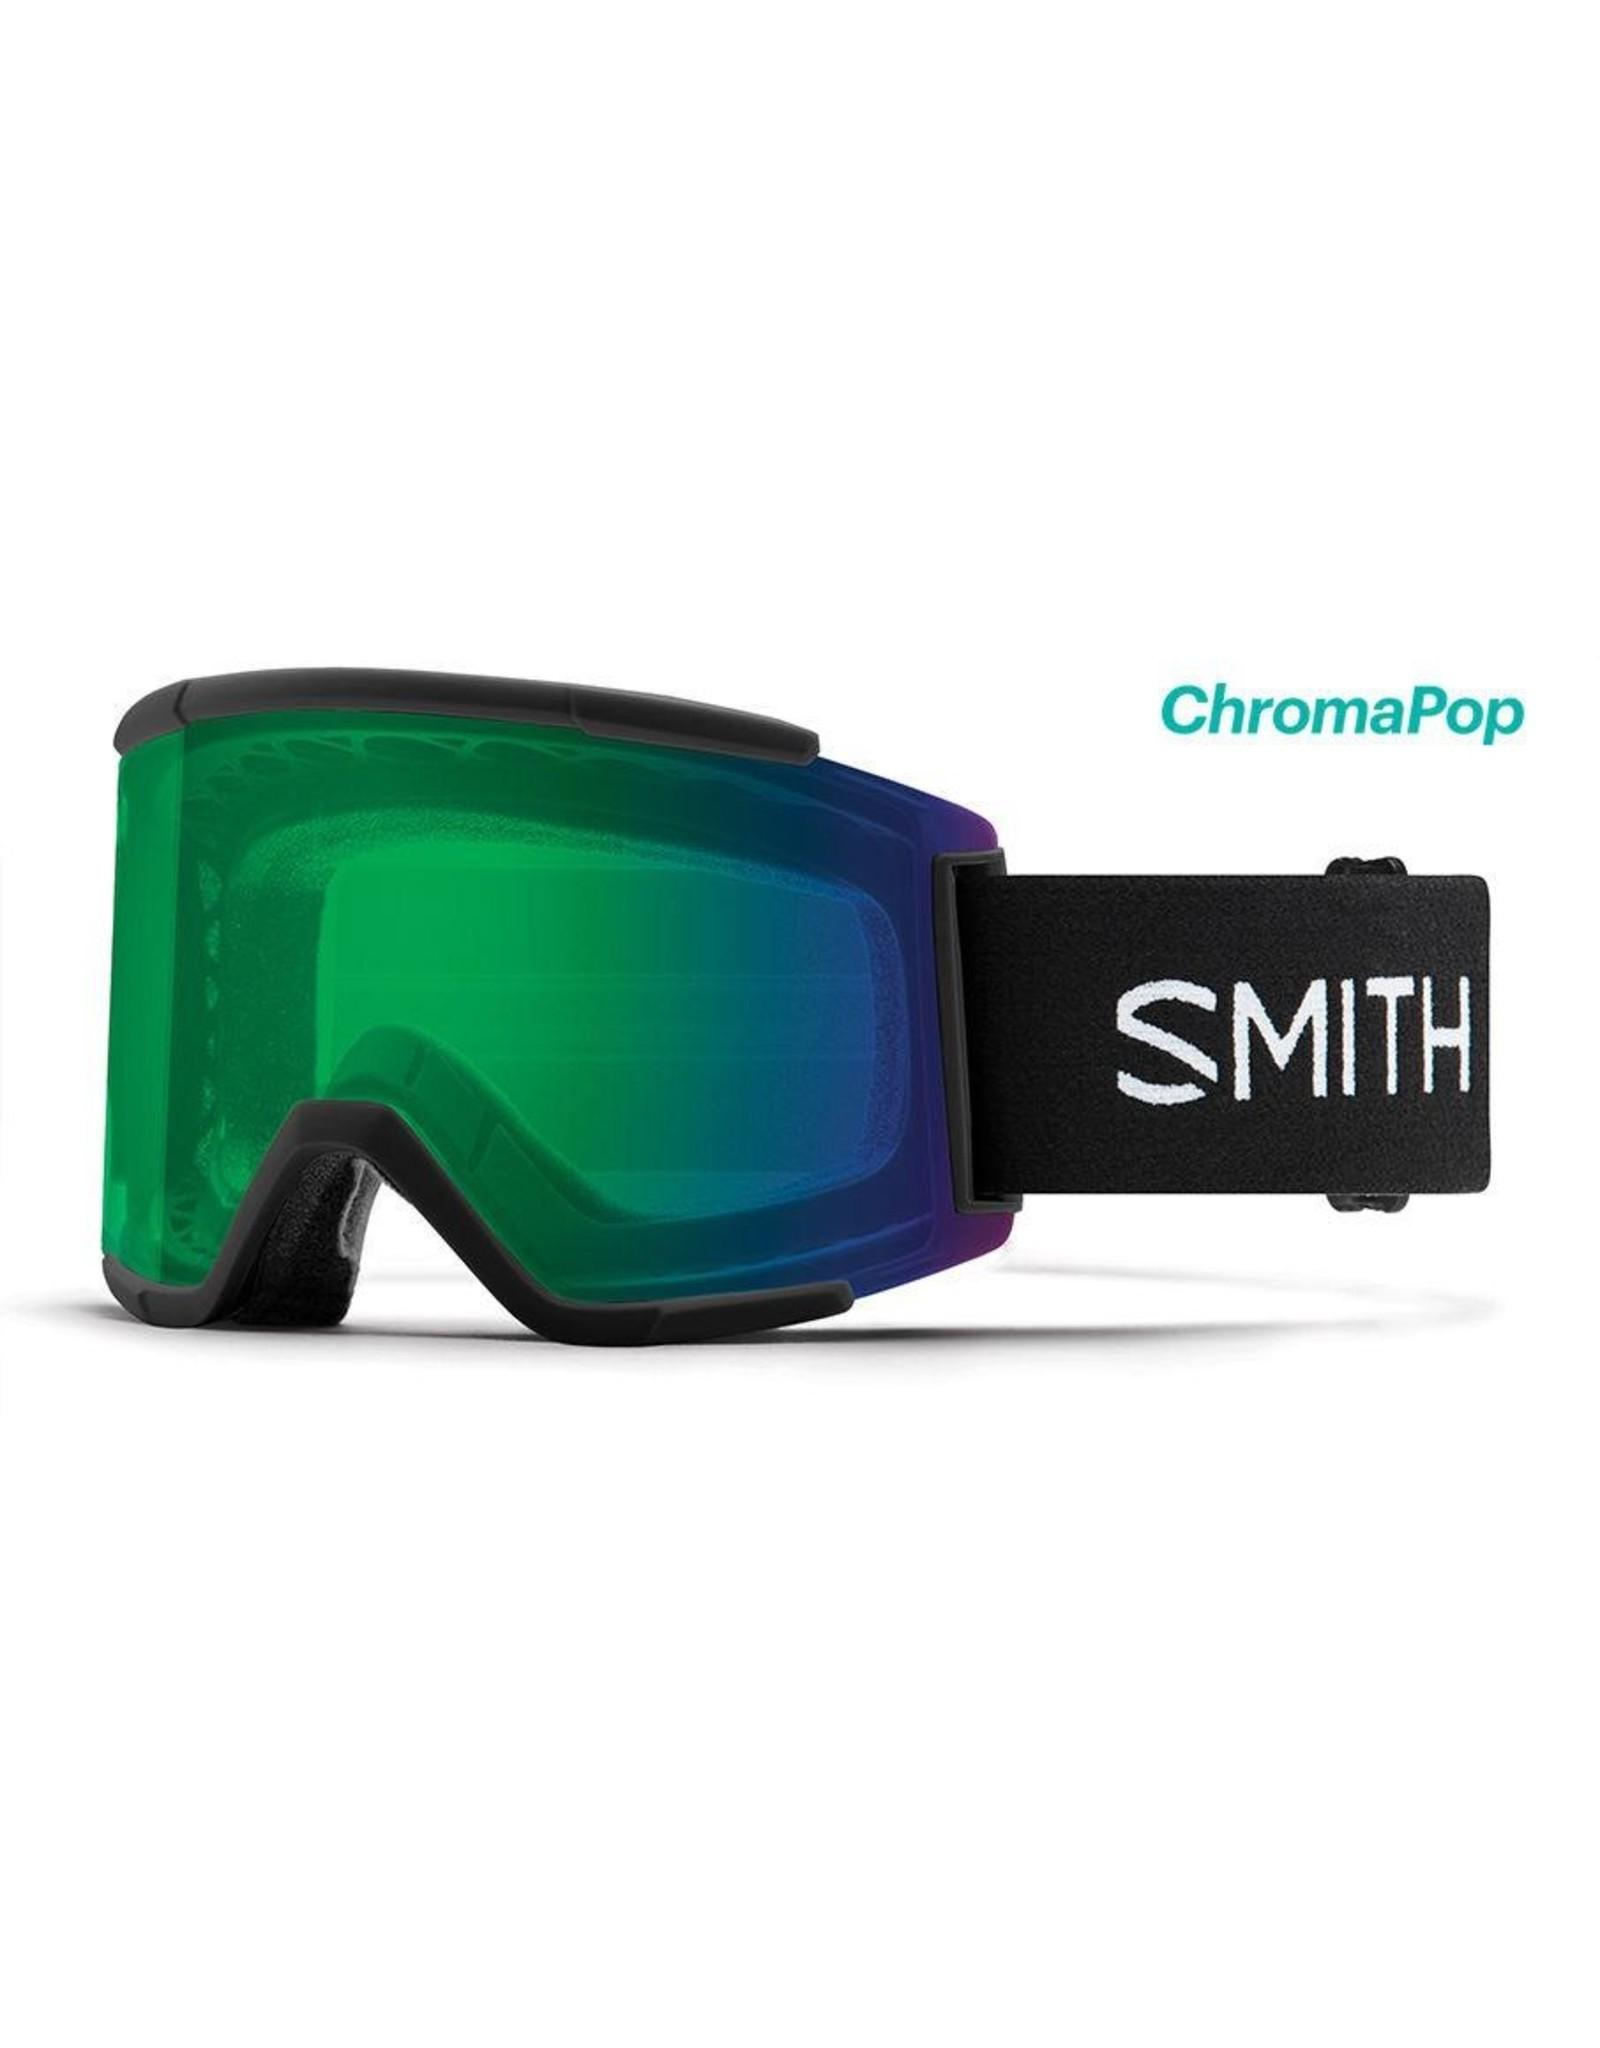 Smith Smith - Squad XL - Black - ChromaPop Everyday Green Mirror